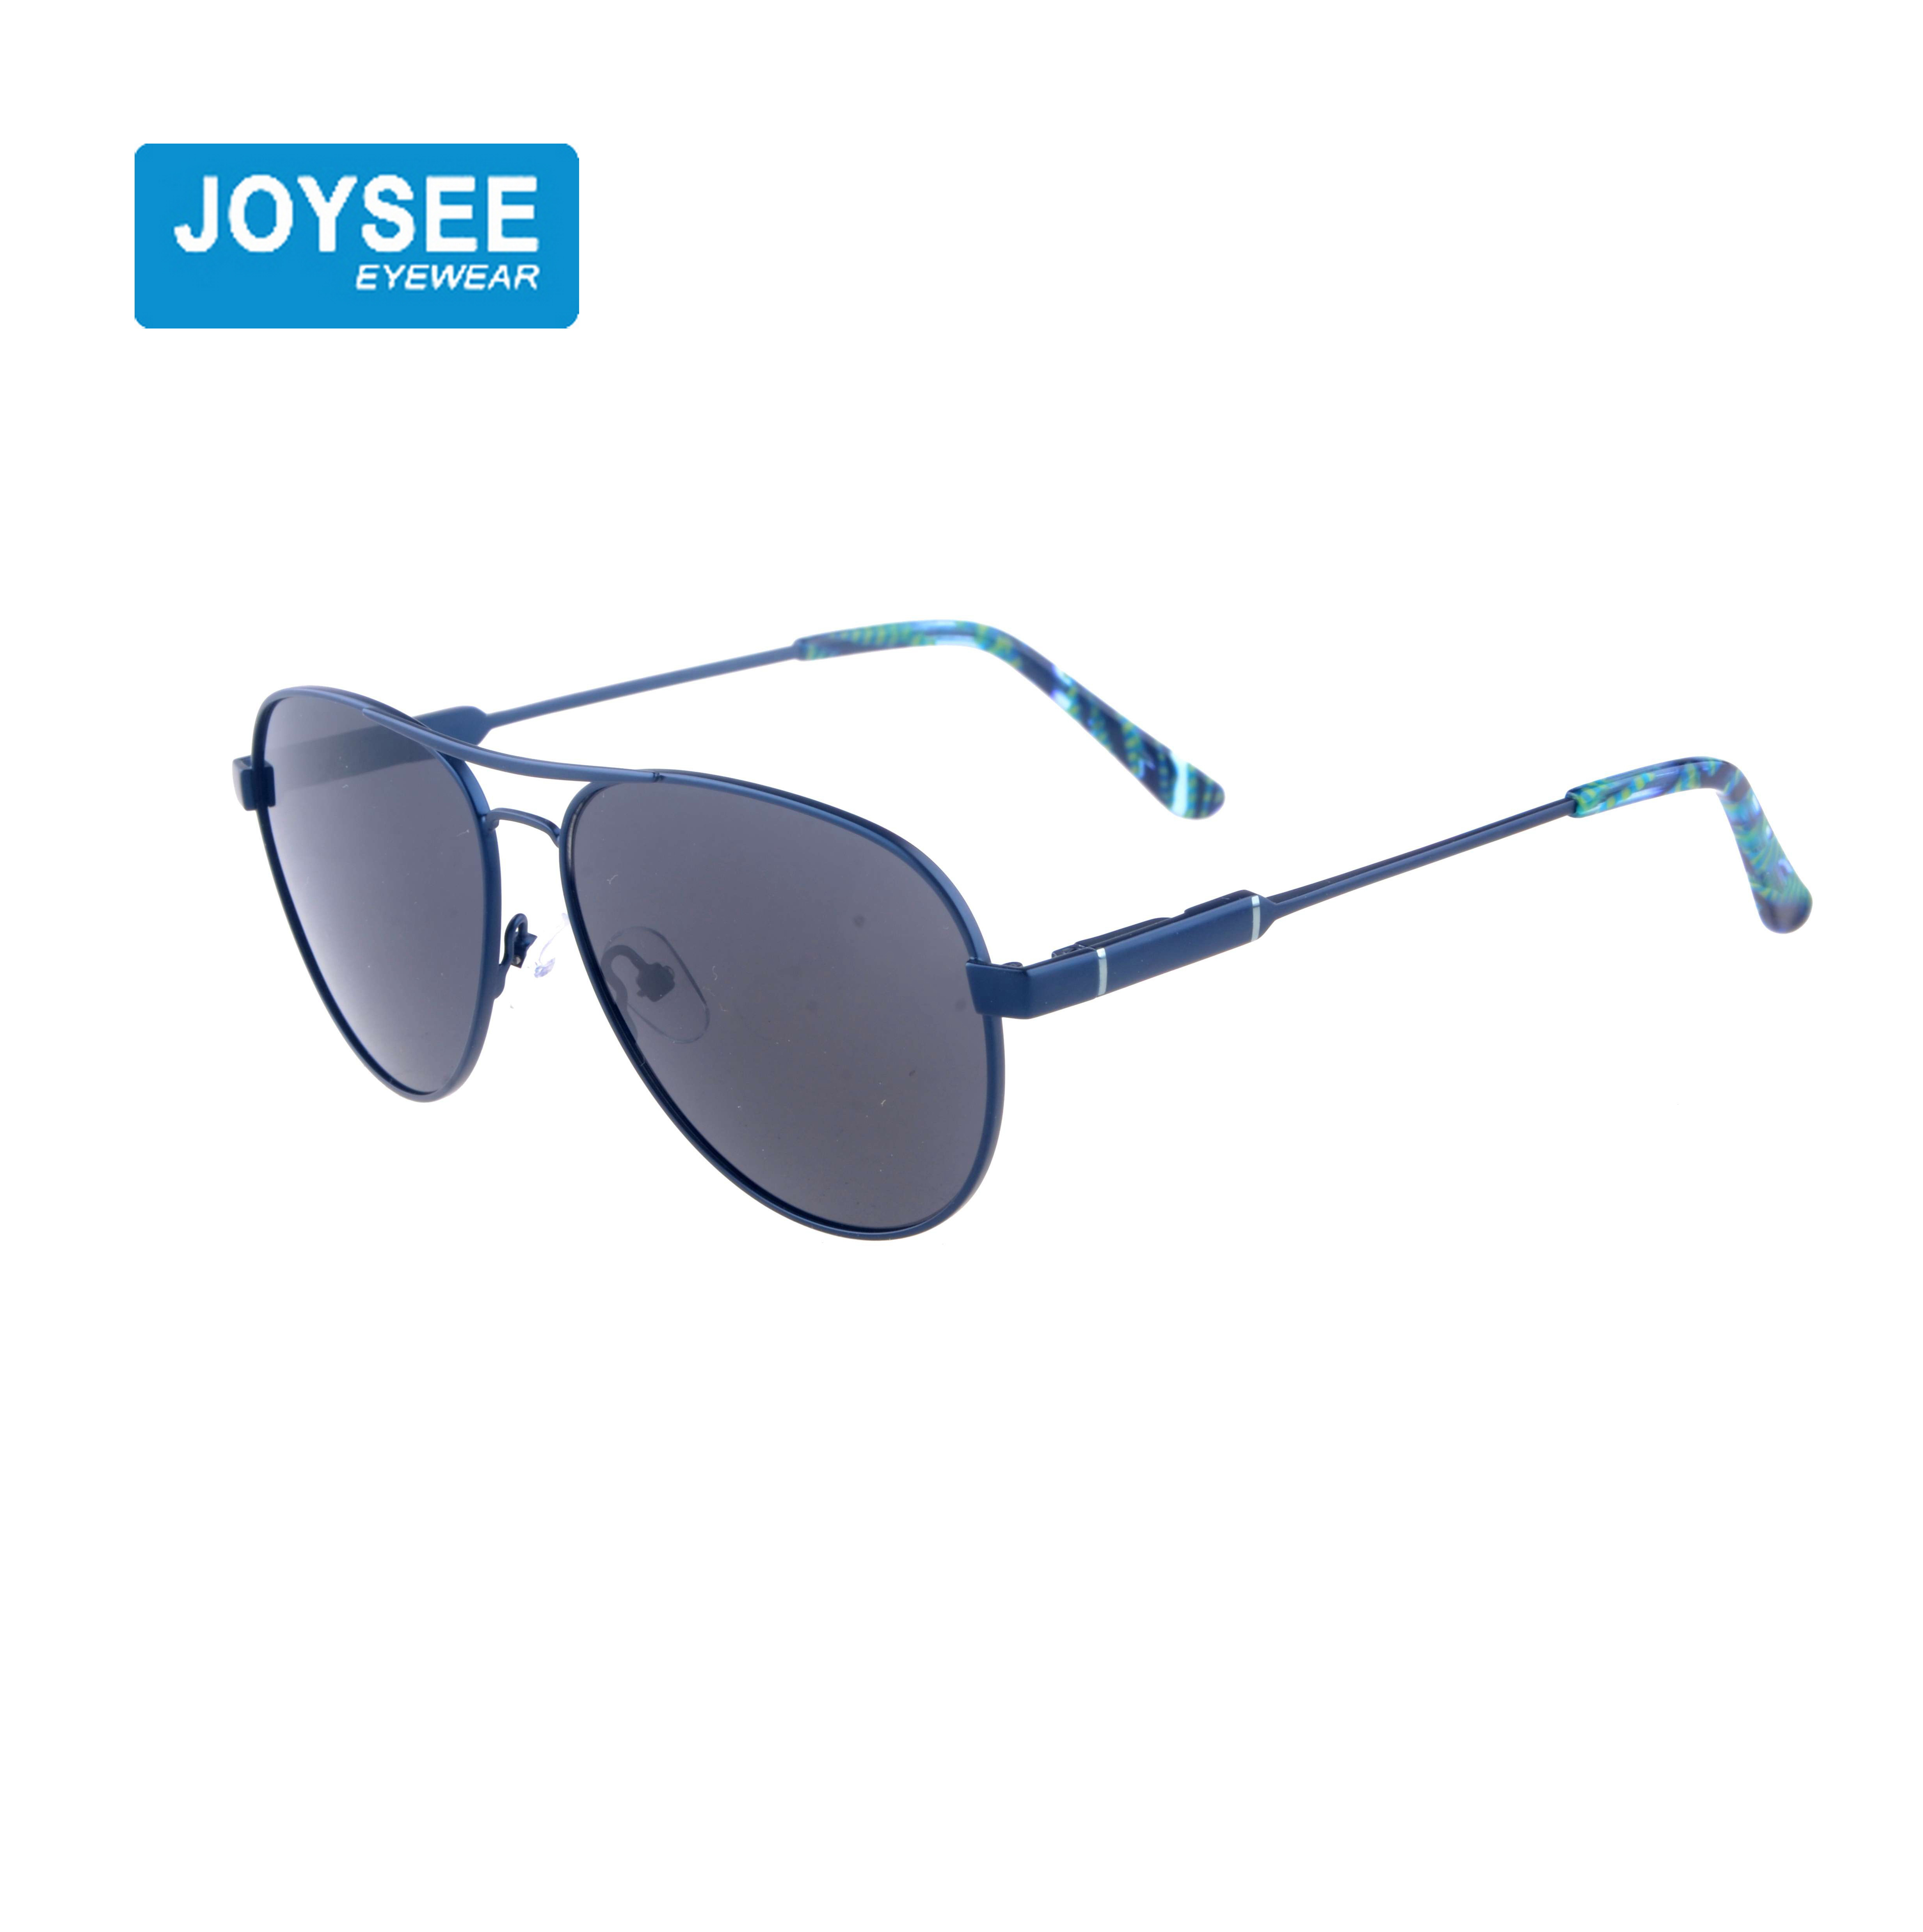 8beea17a7728 China aviator sunglasses wholesale 🇨🇳 - Alibaba